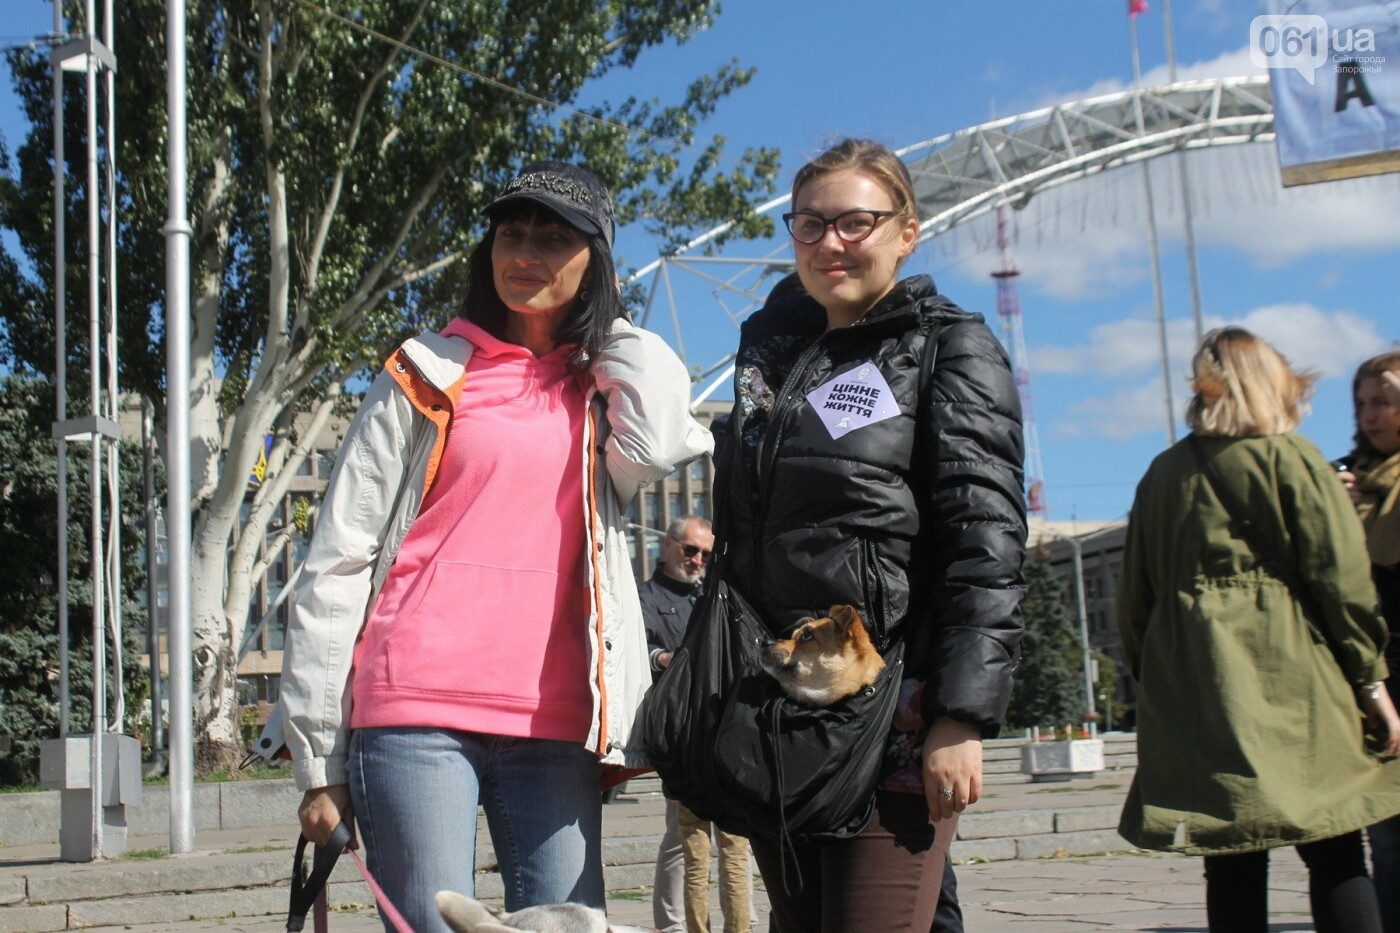 «Защити! Не мучай»: в Запорожье провели марш за права животных, – ФОТОРЕПОРТАЖ, ВИДЕО, фото-17